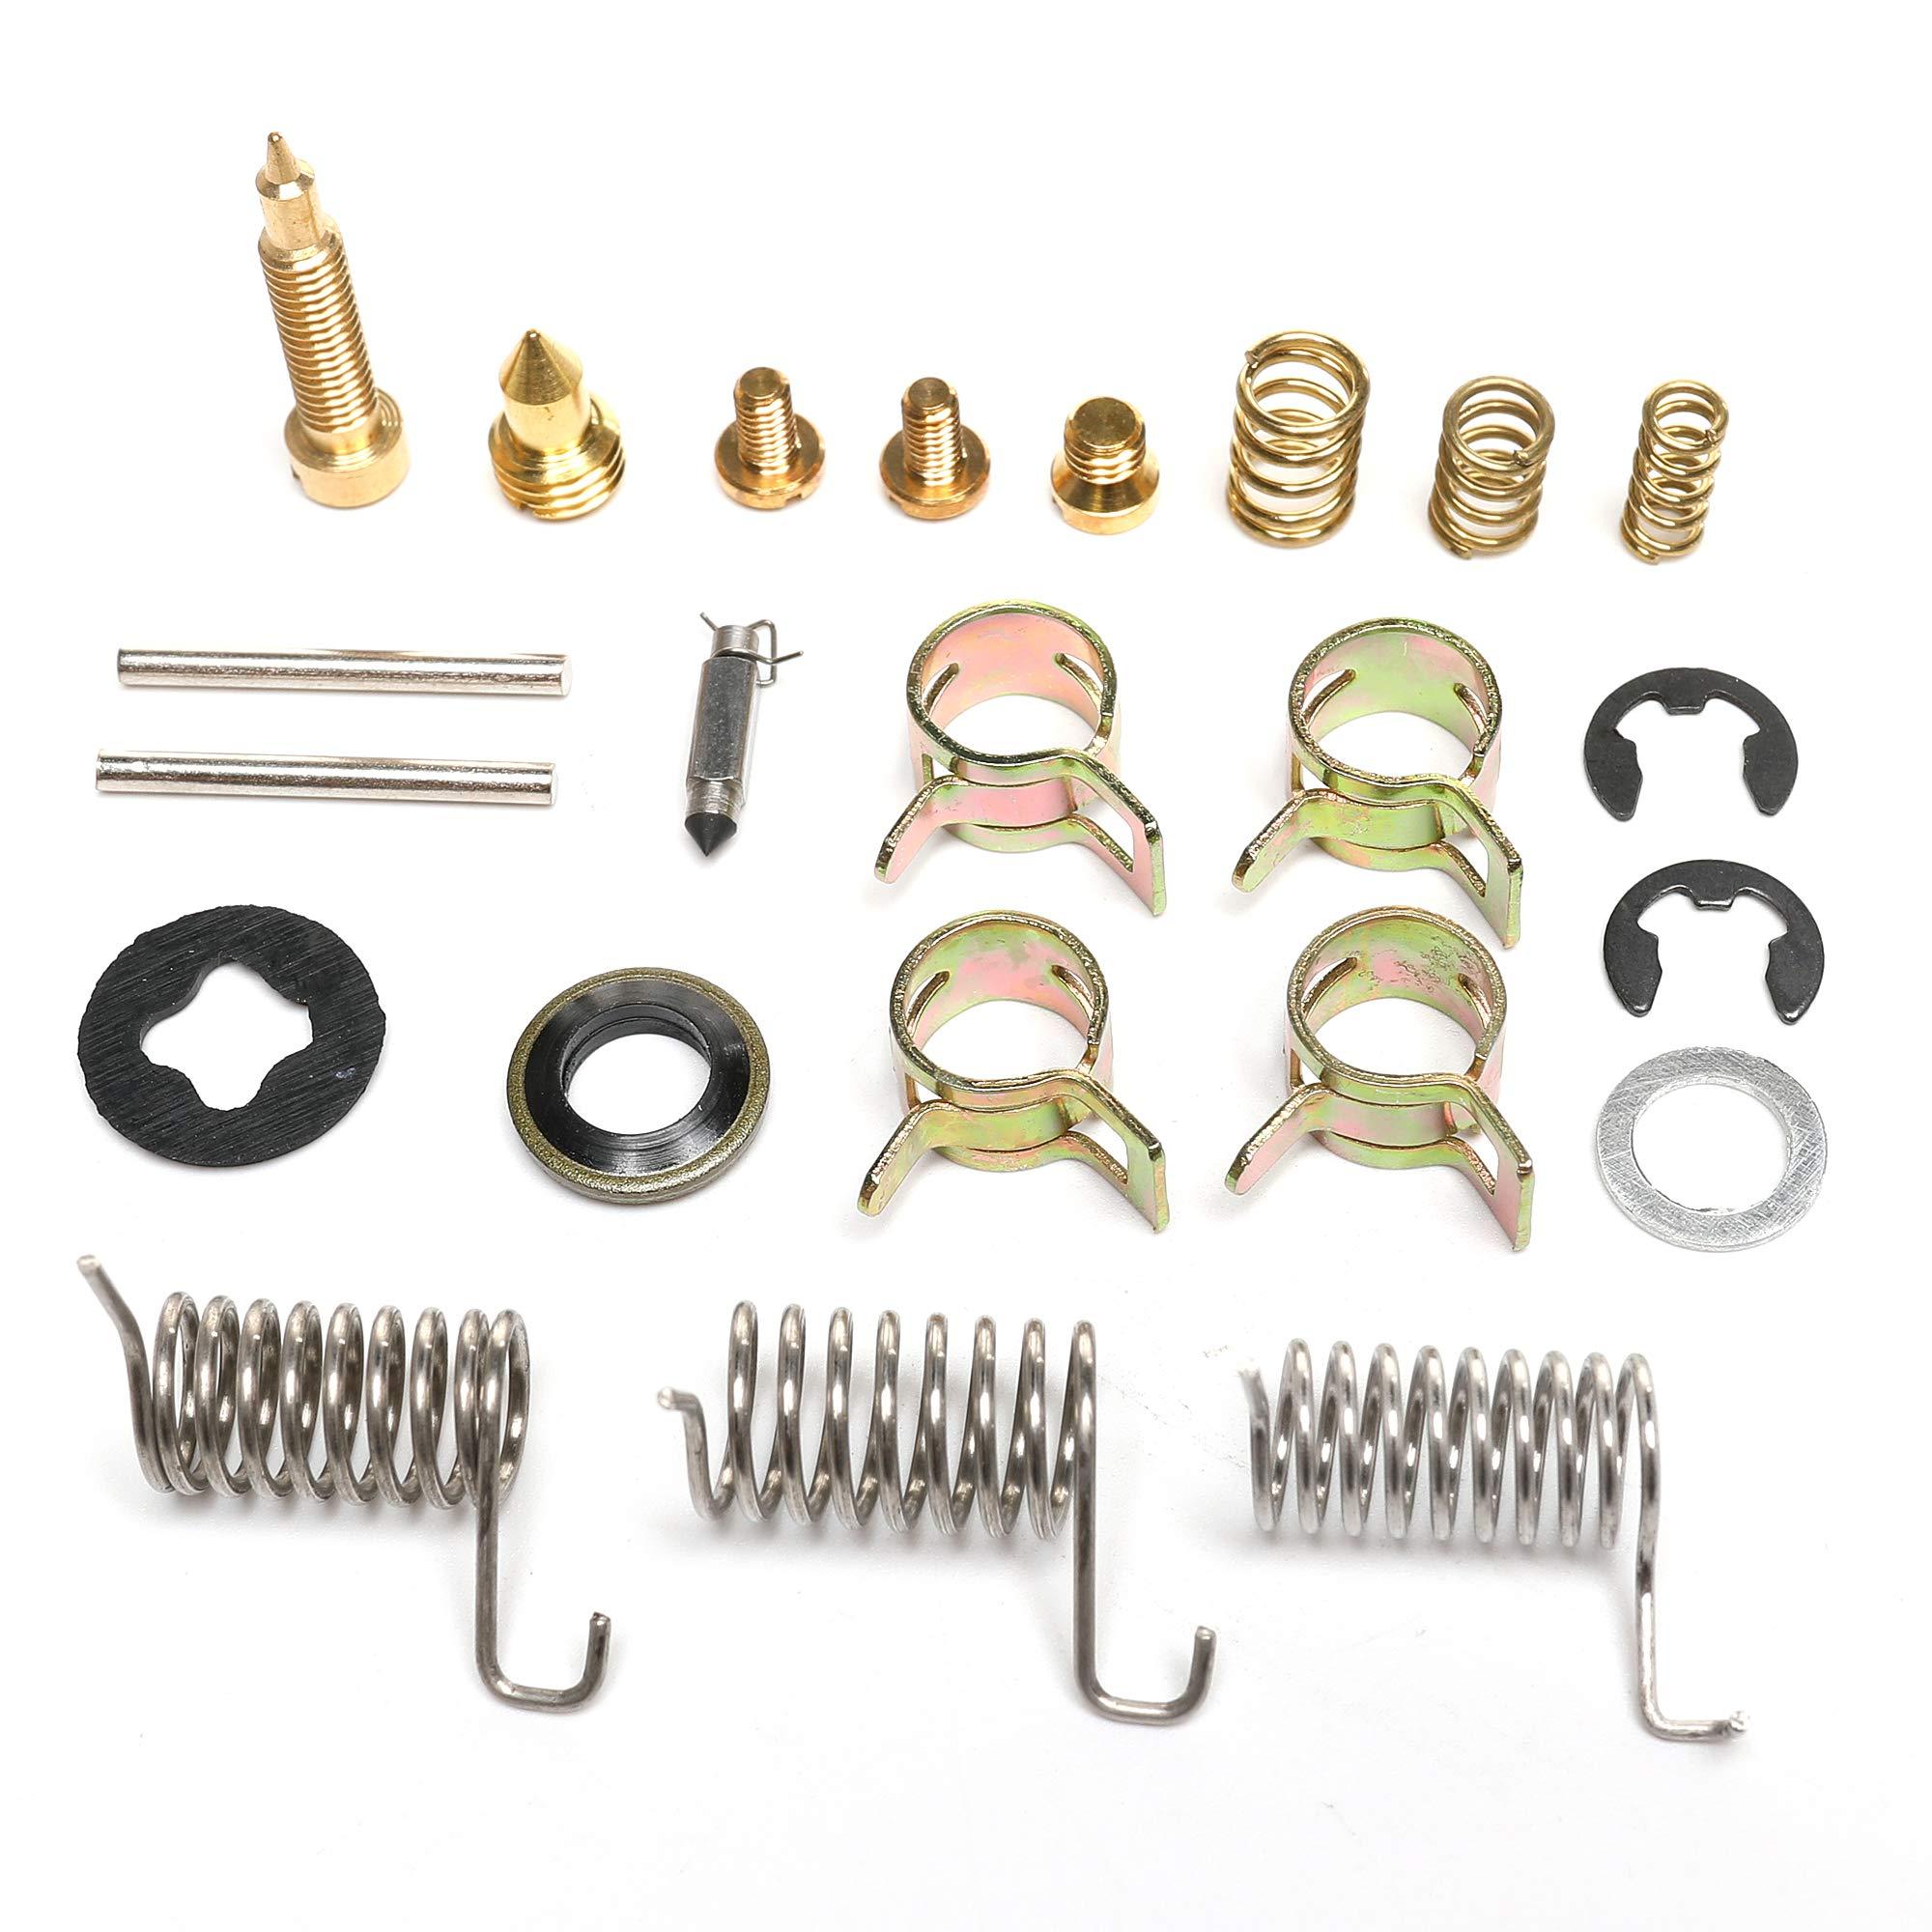 iFJF 18-7750-1 Carburetor Kit For Sierra Mercury Mariner Outboard Motor Replaces 1395-8236354 by iFJF (Image #5)